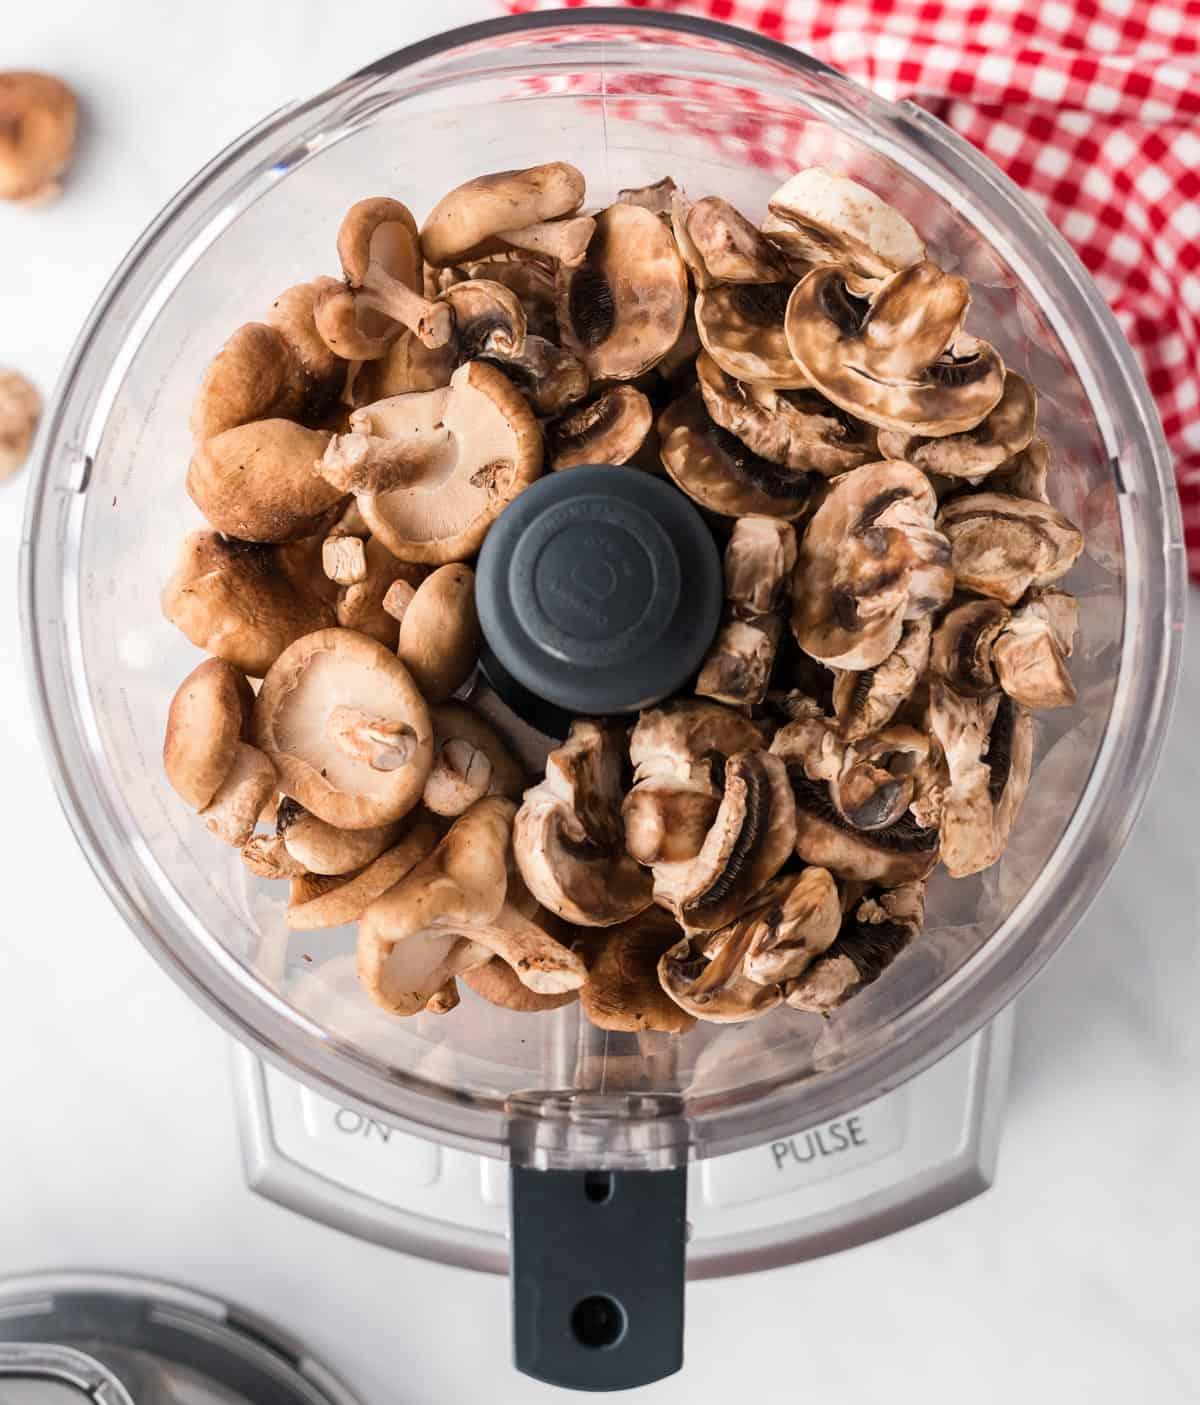 mushrooms in a food processor